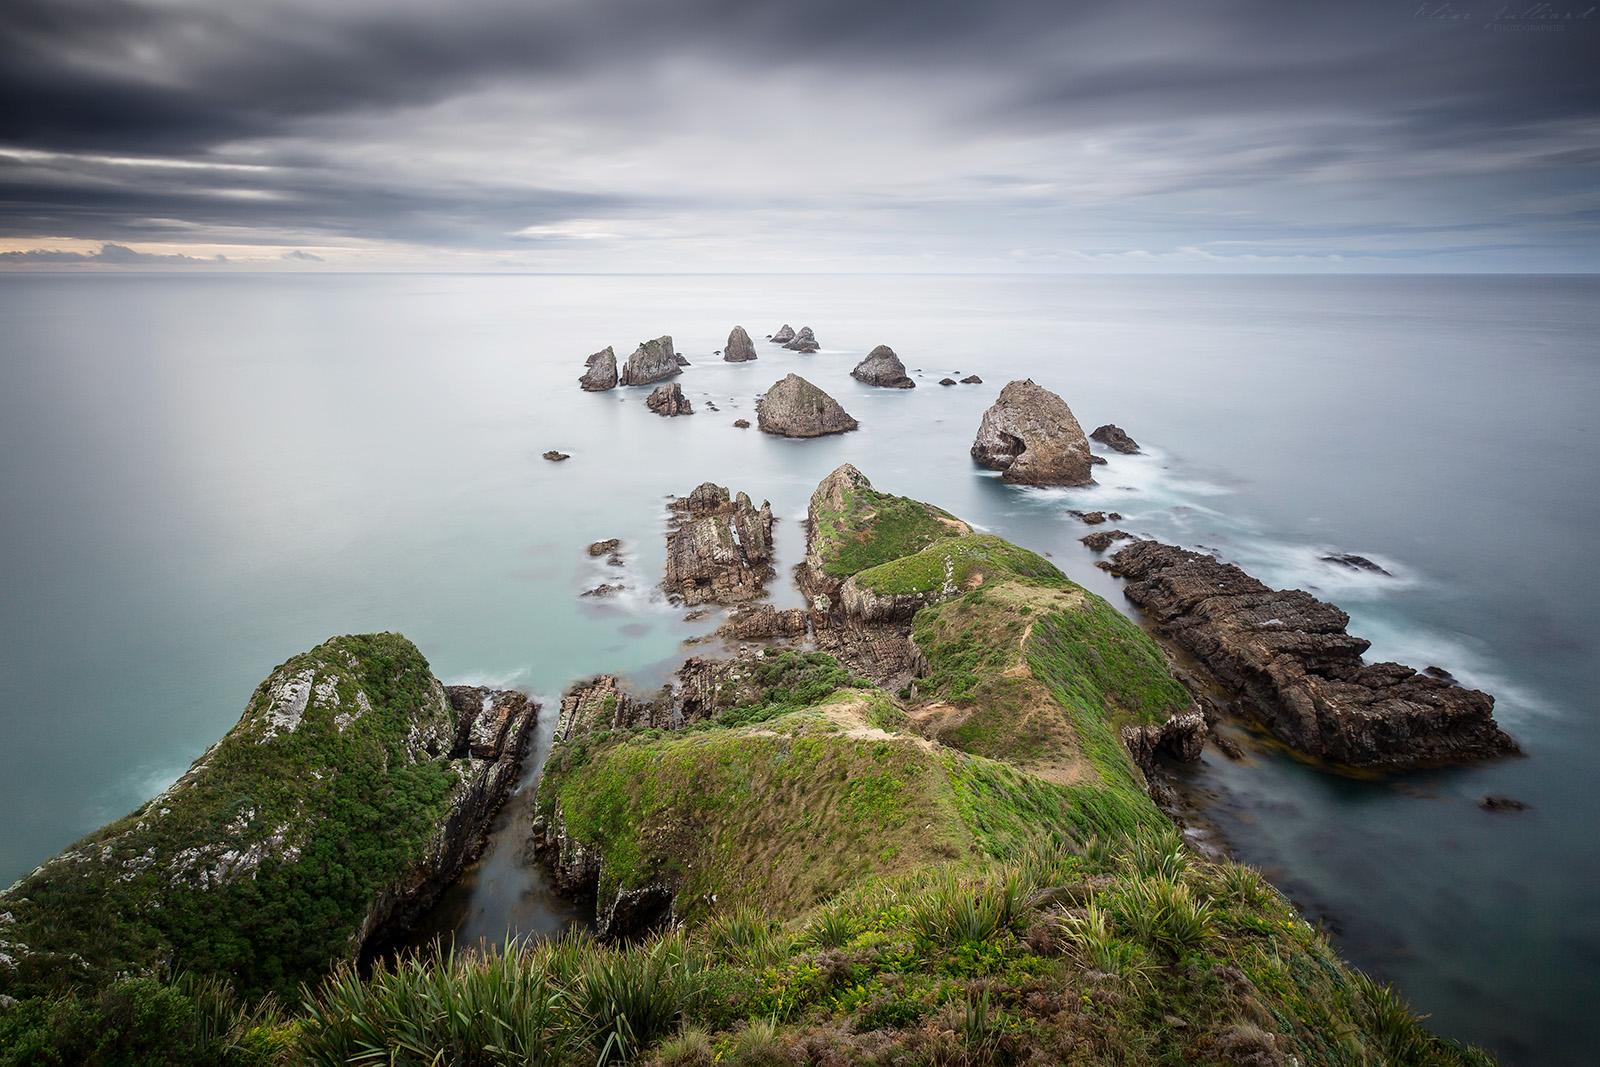 nugget-point-new-zealand-nouvelle-zelande-south-island-ile-sud-otago-catlins-forest-park-lighthouse-phare-elise-julliard-photographe-paysage-landscape-pacific-ocean